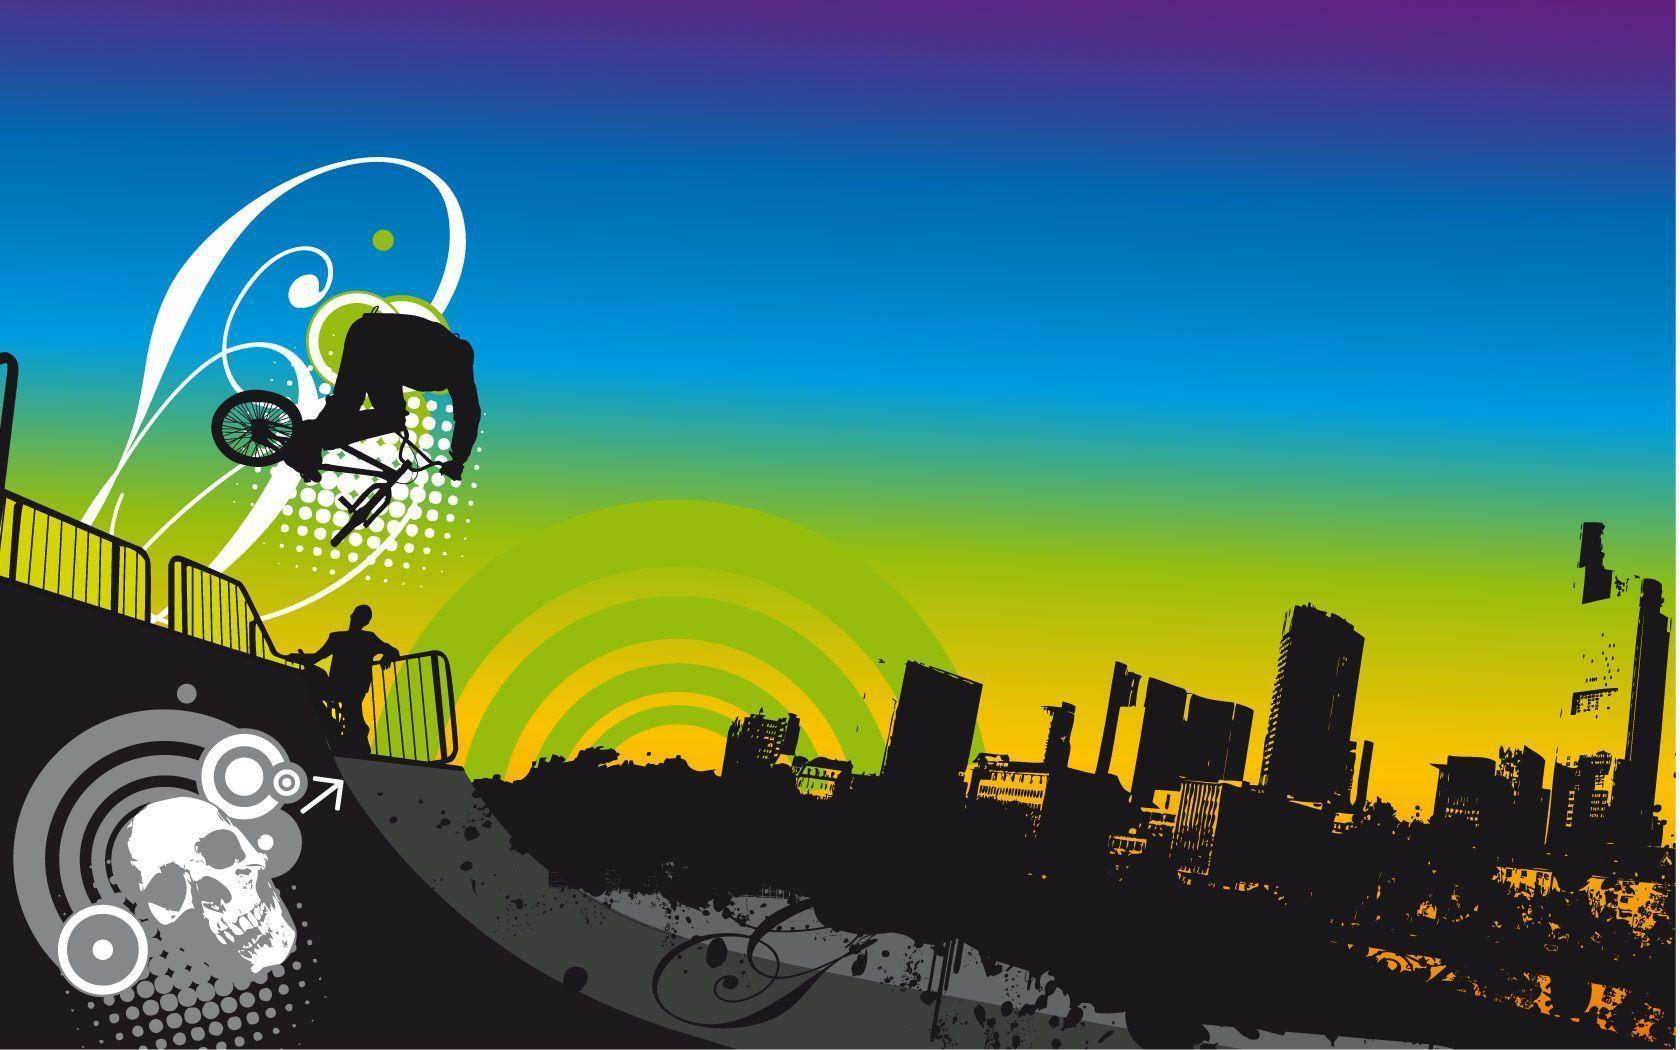 Download Bmx Bike Wallpapers Gallery: Wallpaper Cave